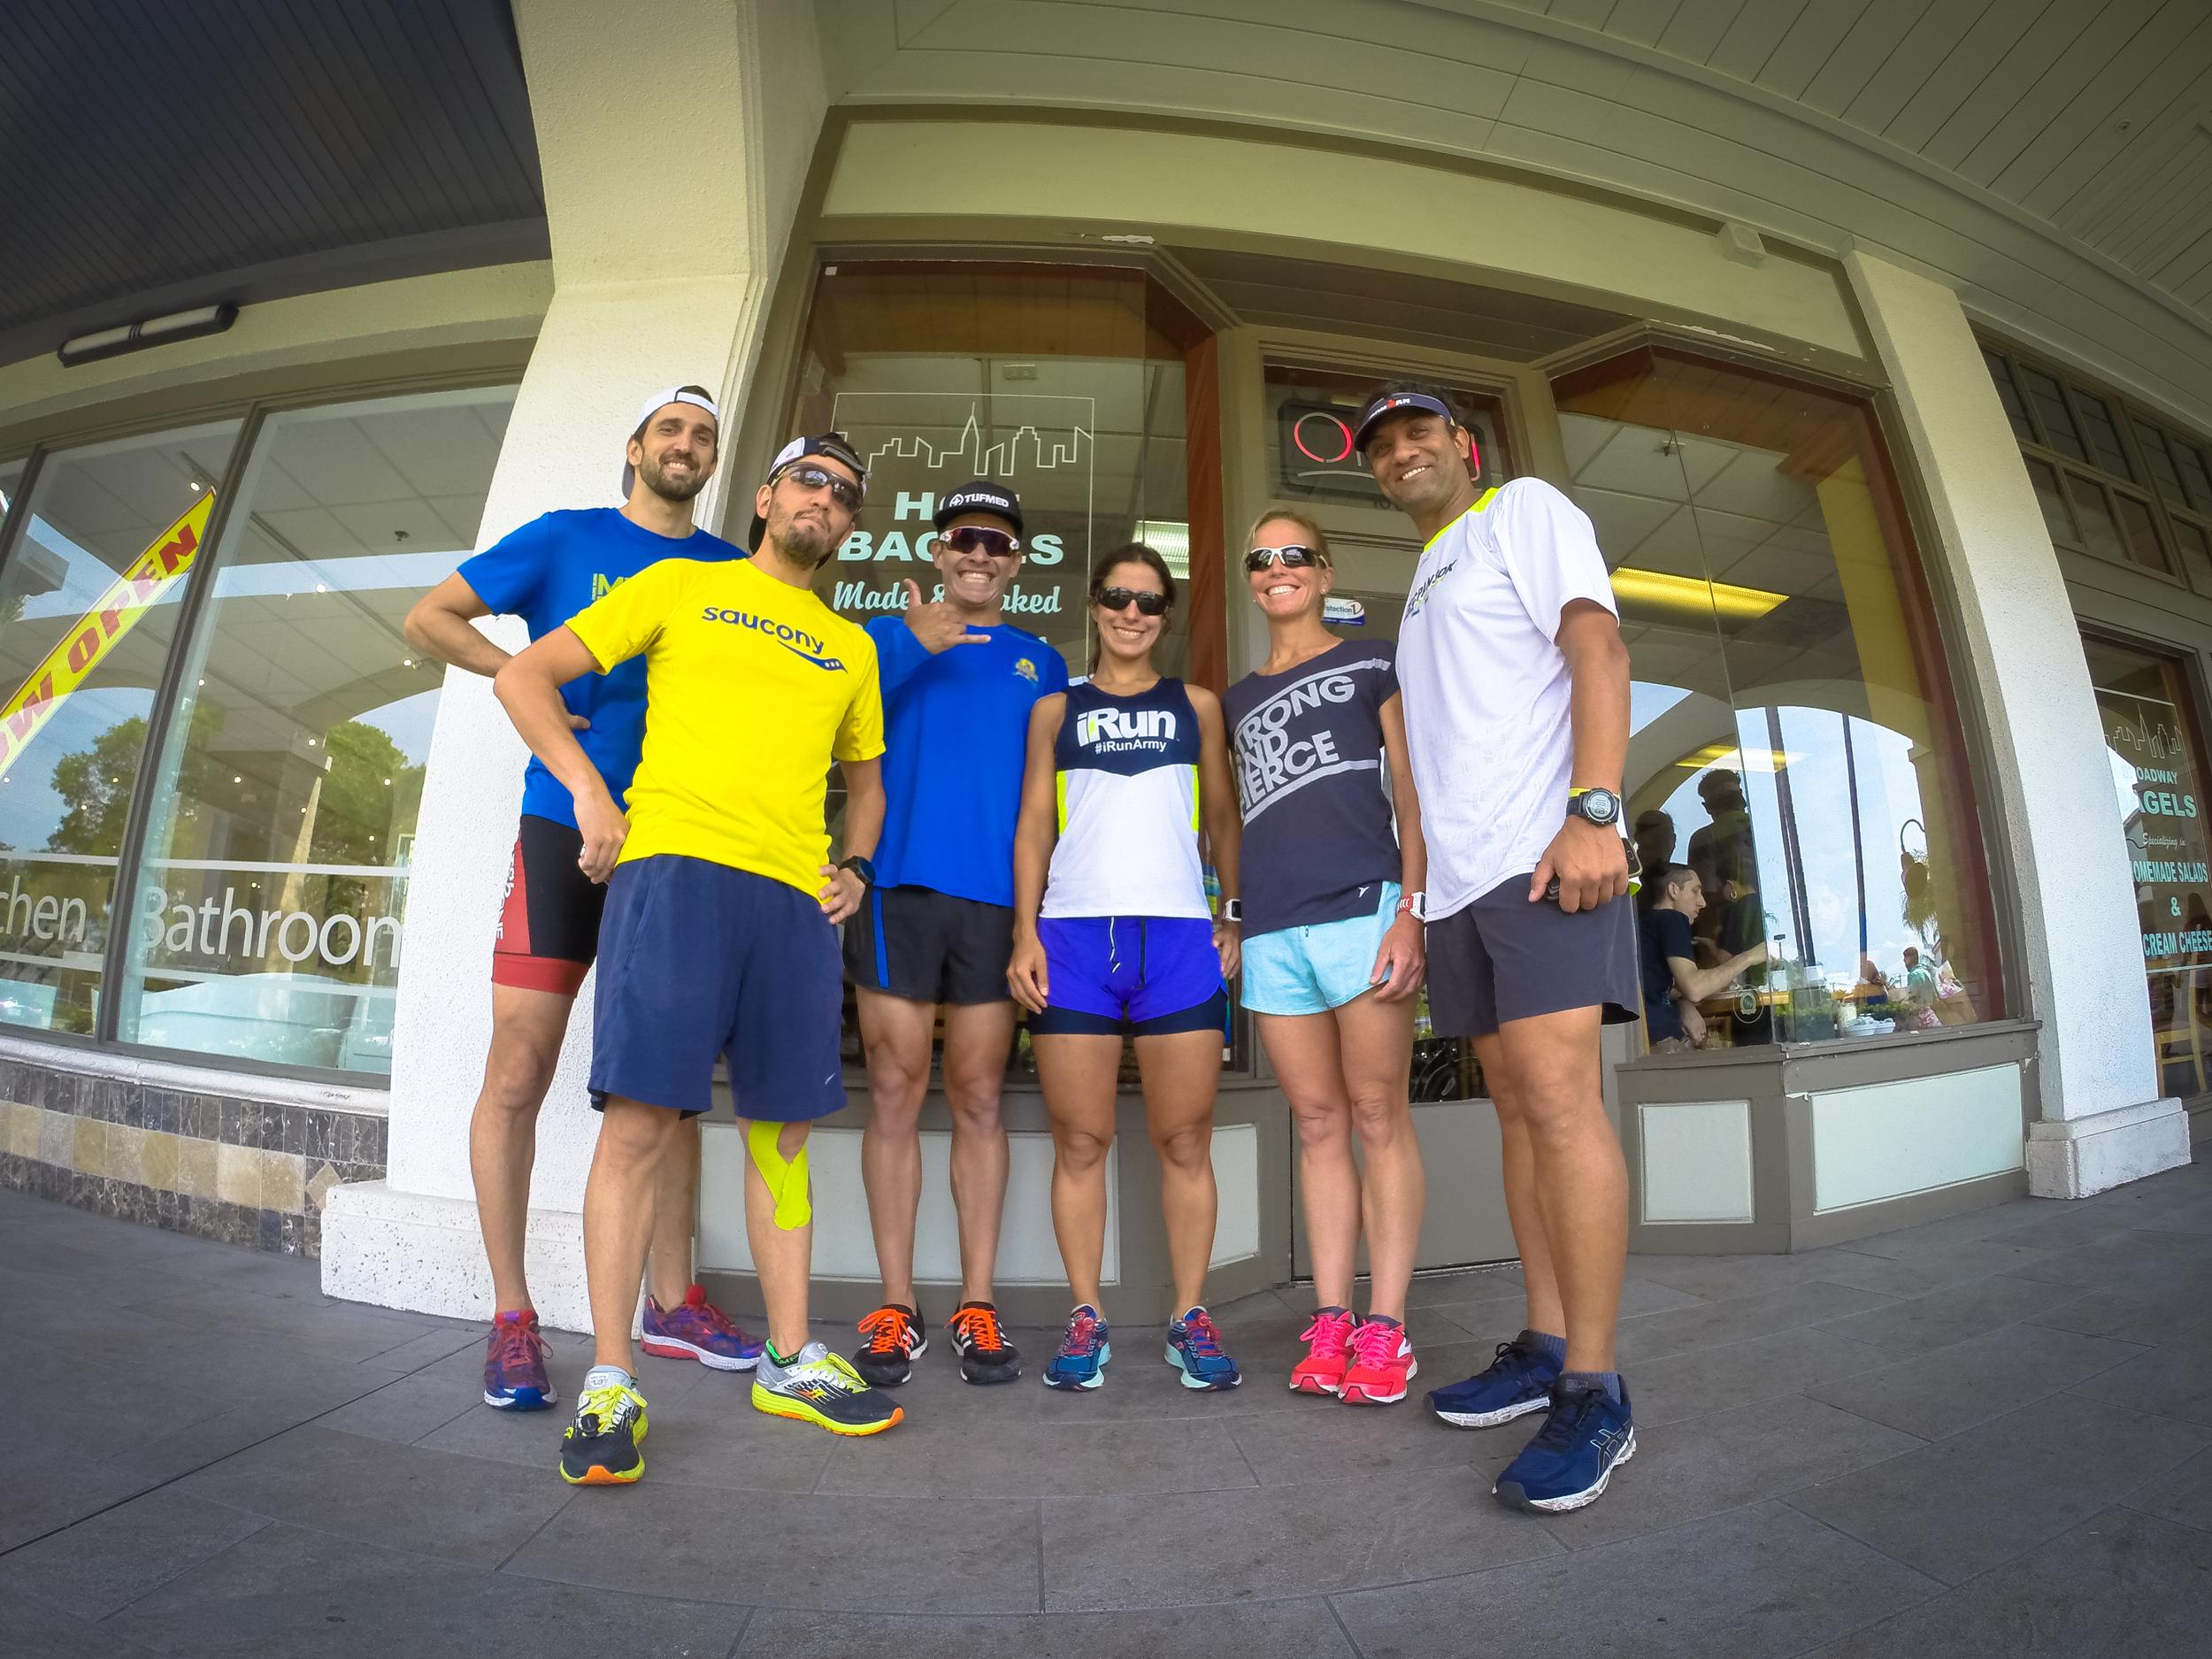 The Ironman Texas crew on Saturday!